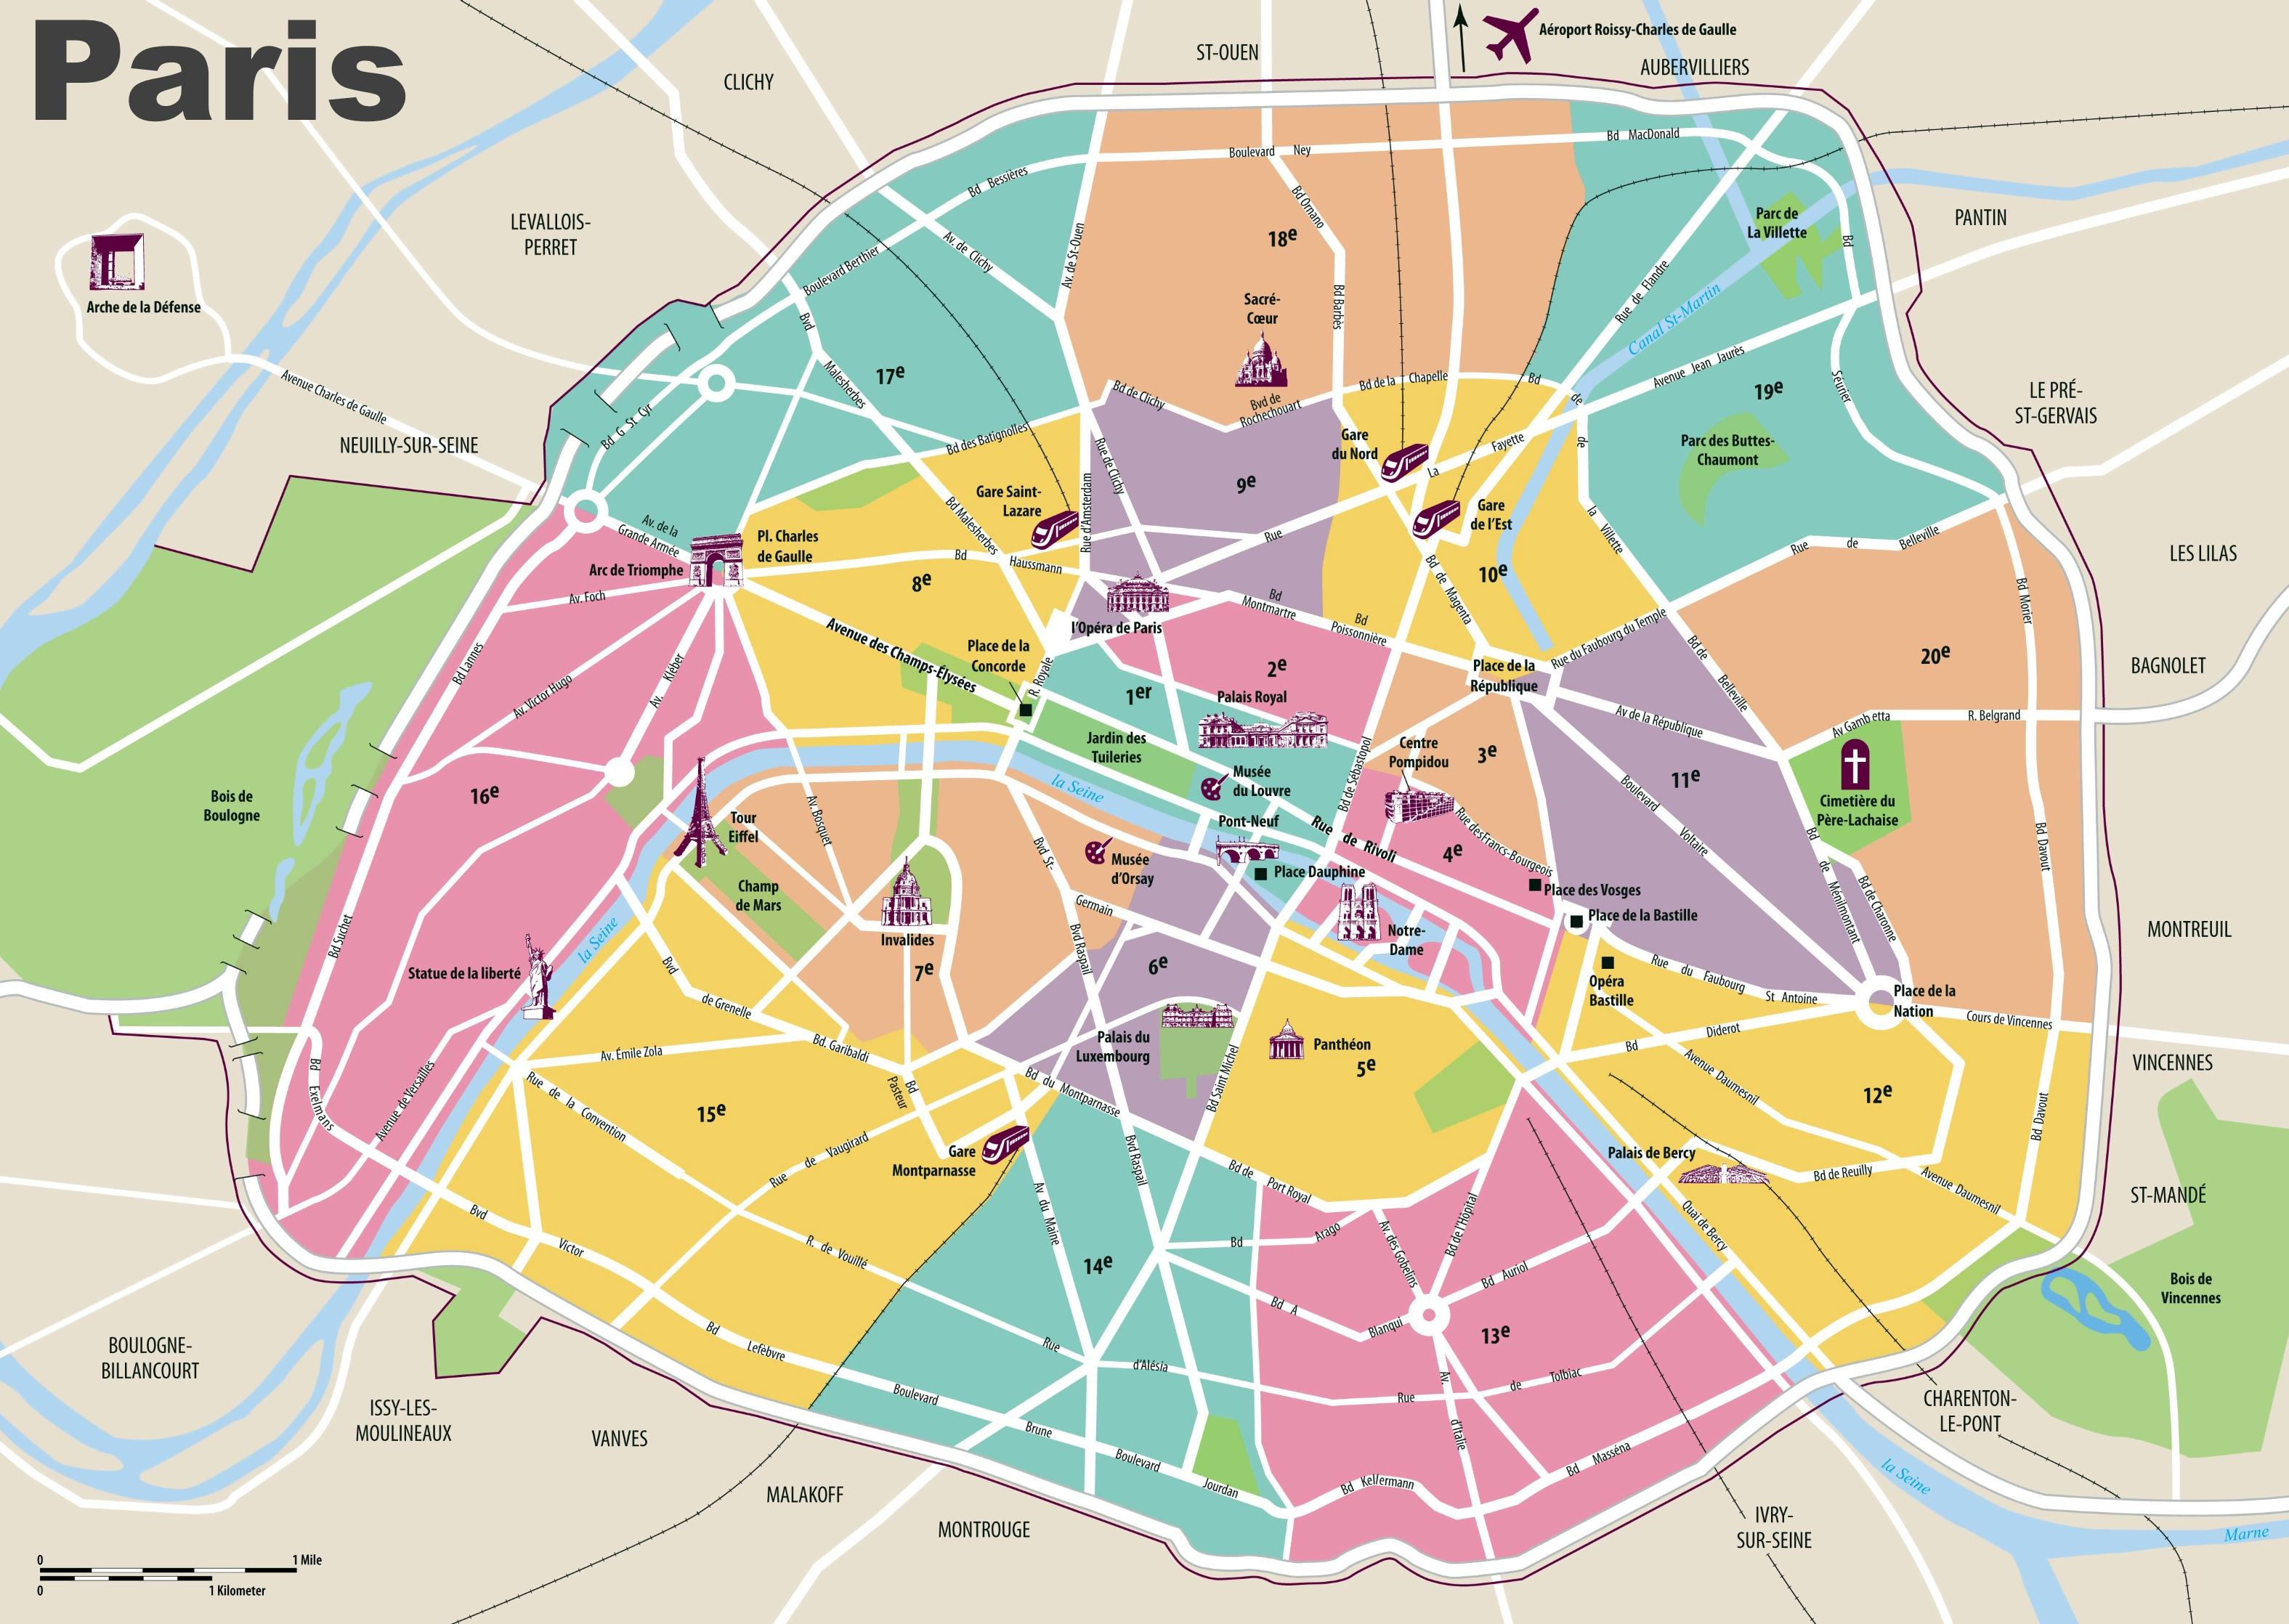 Parigi Cartina Monumenti.Parigi Mappa Di Viaggio Parigi Mappa Visitatori Ile De France Francia